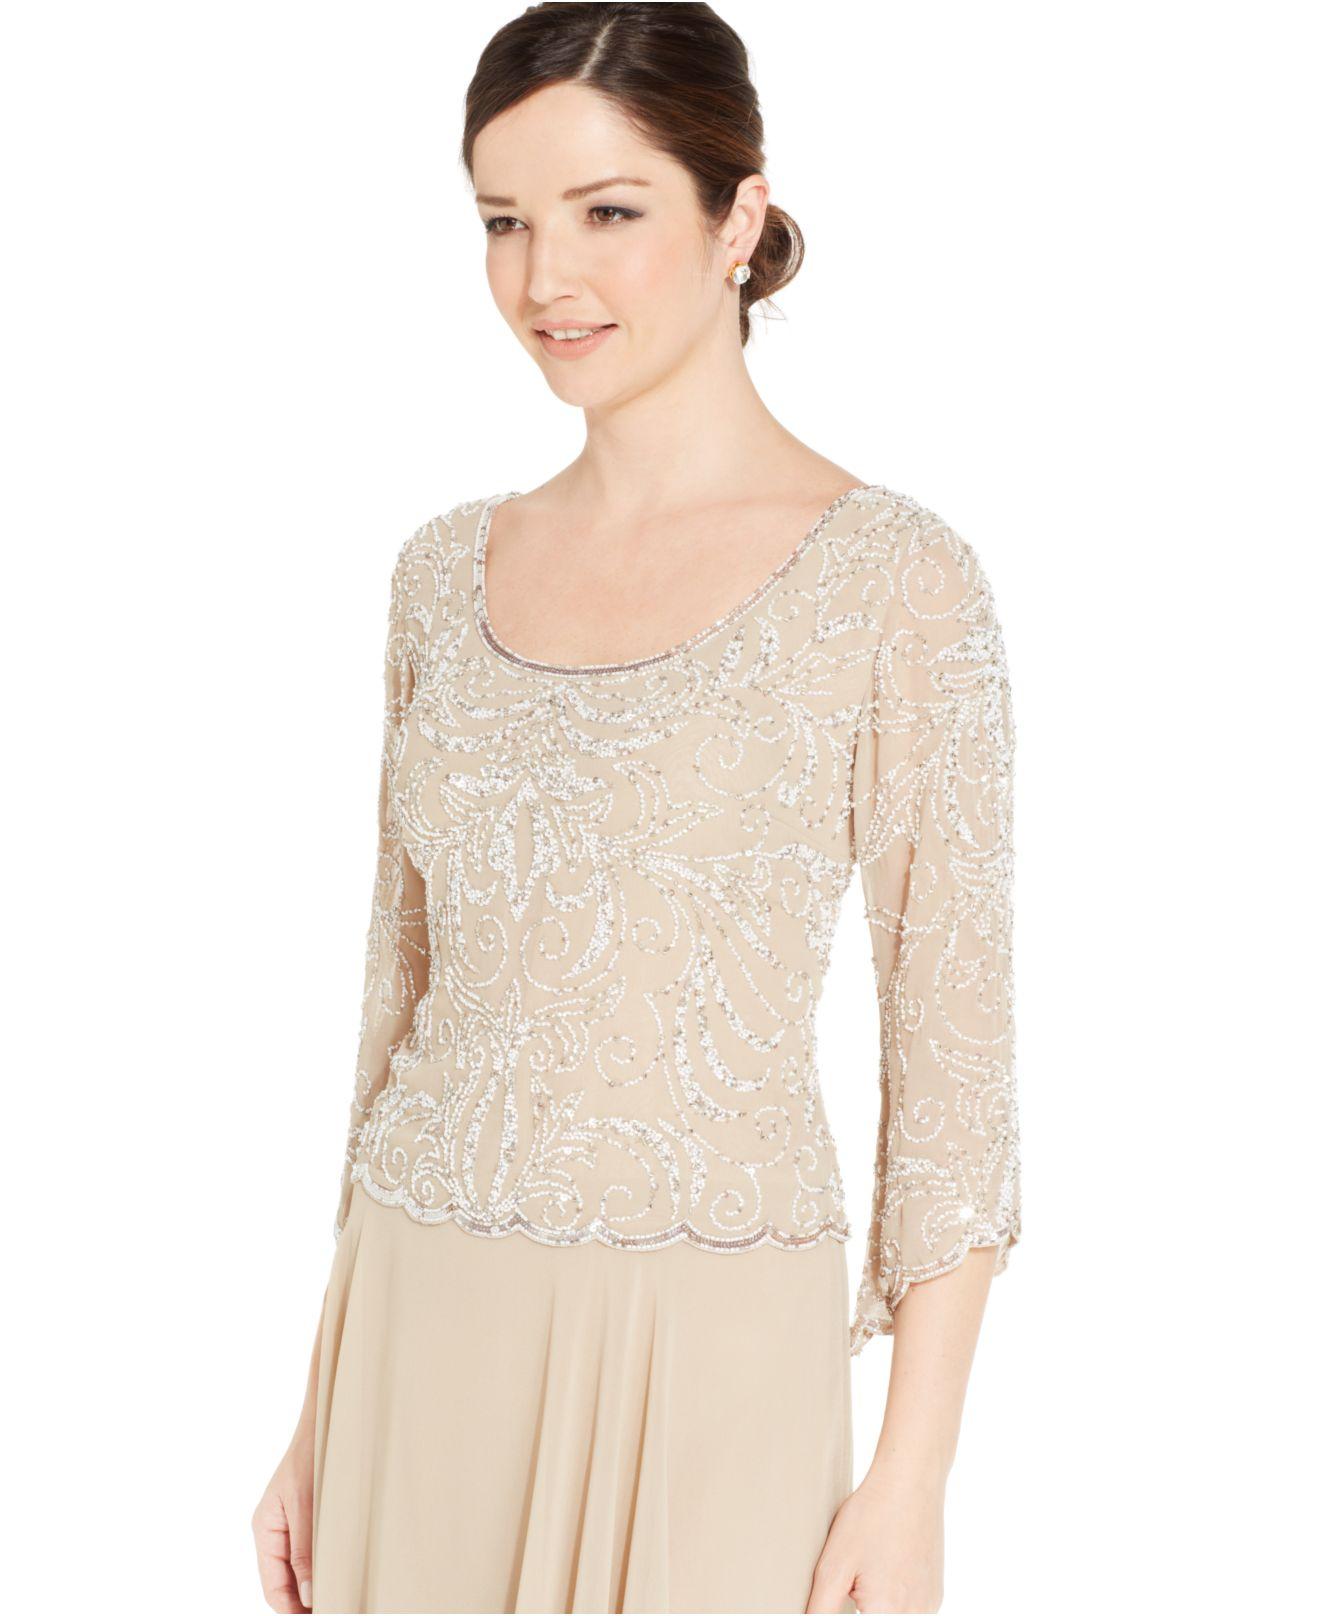 J Kara Sequin Gown – Fashion dresses